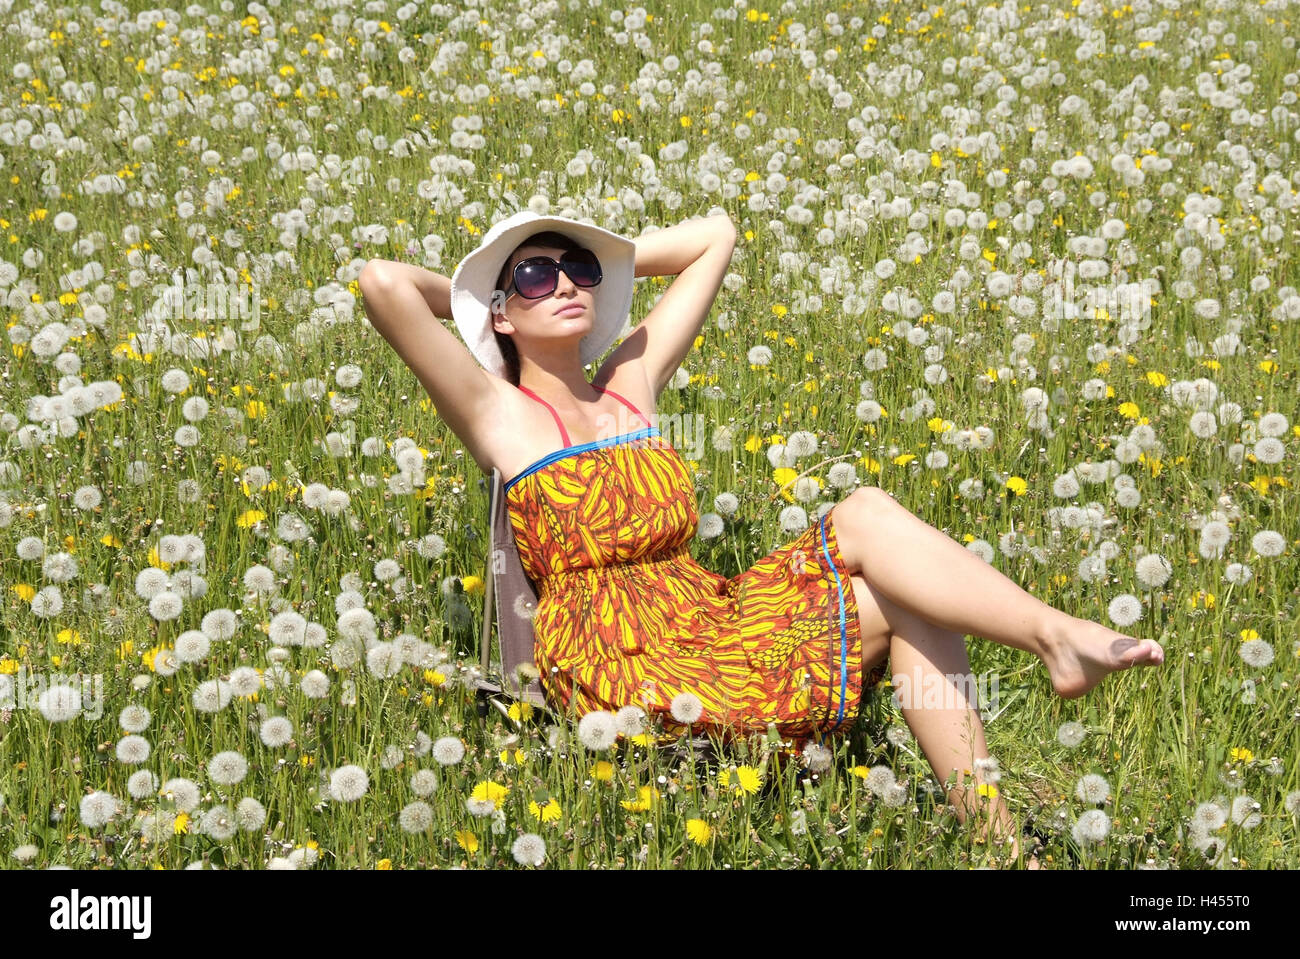 Woman, spring meadow, sitting, sunbath, relaxing, - Stock Image